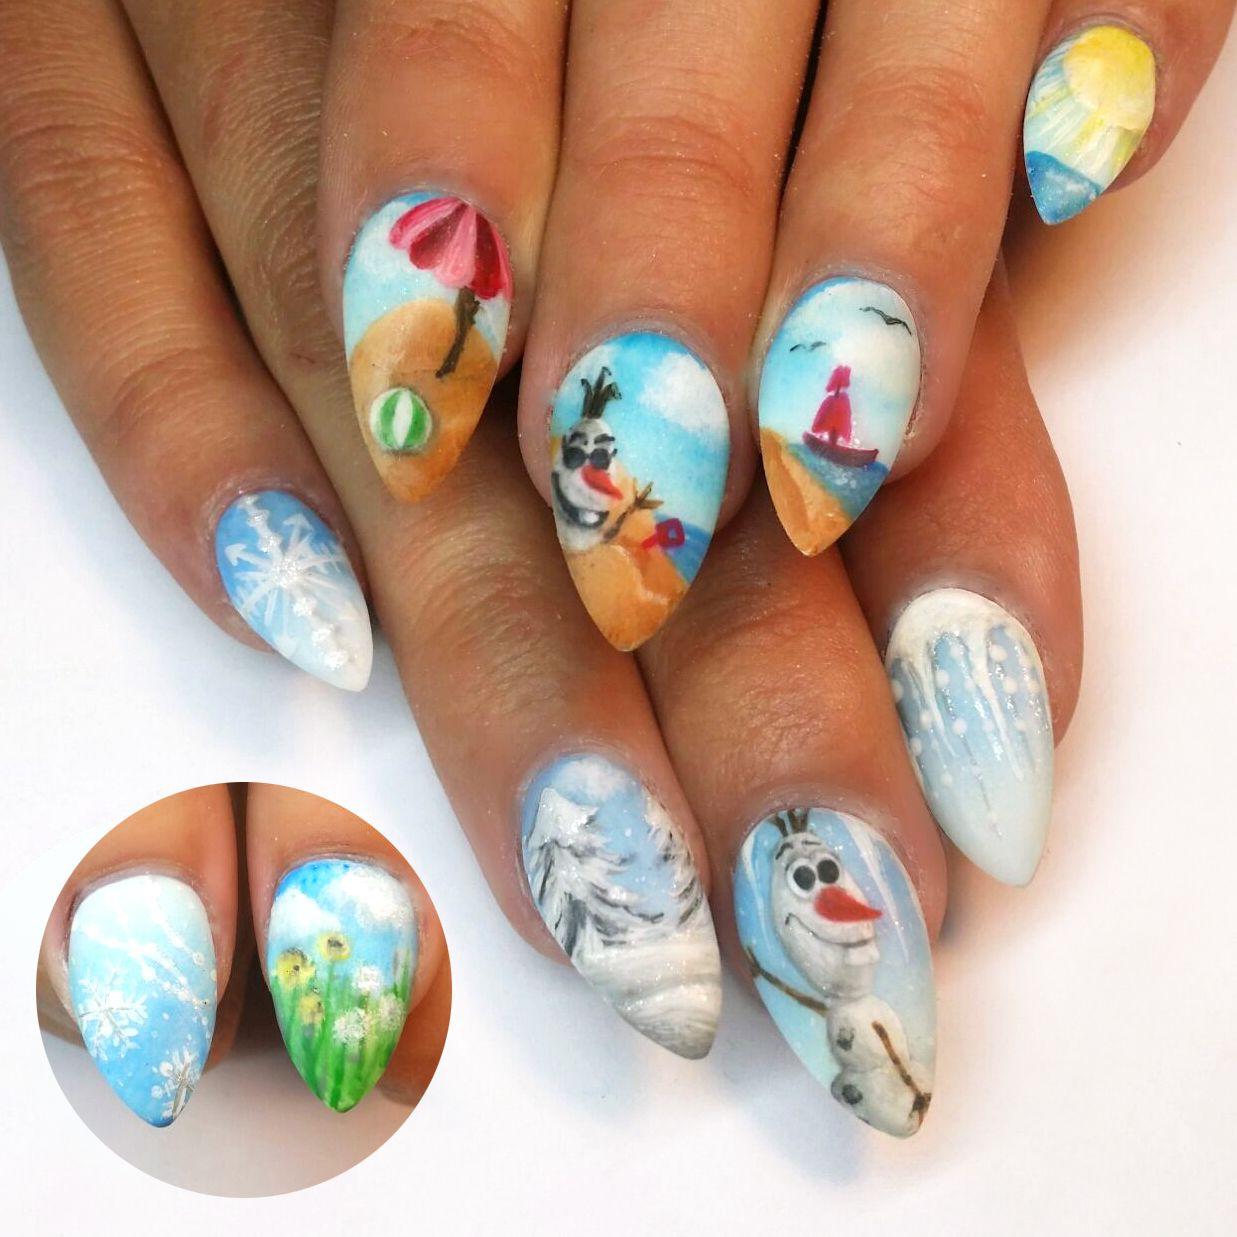 Danielle | Pinterest | Top nail, Nails magazine and Disney nails art